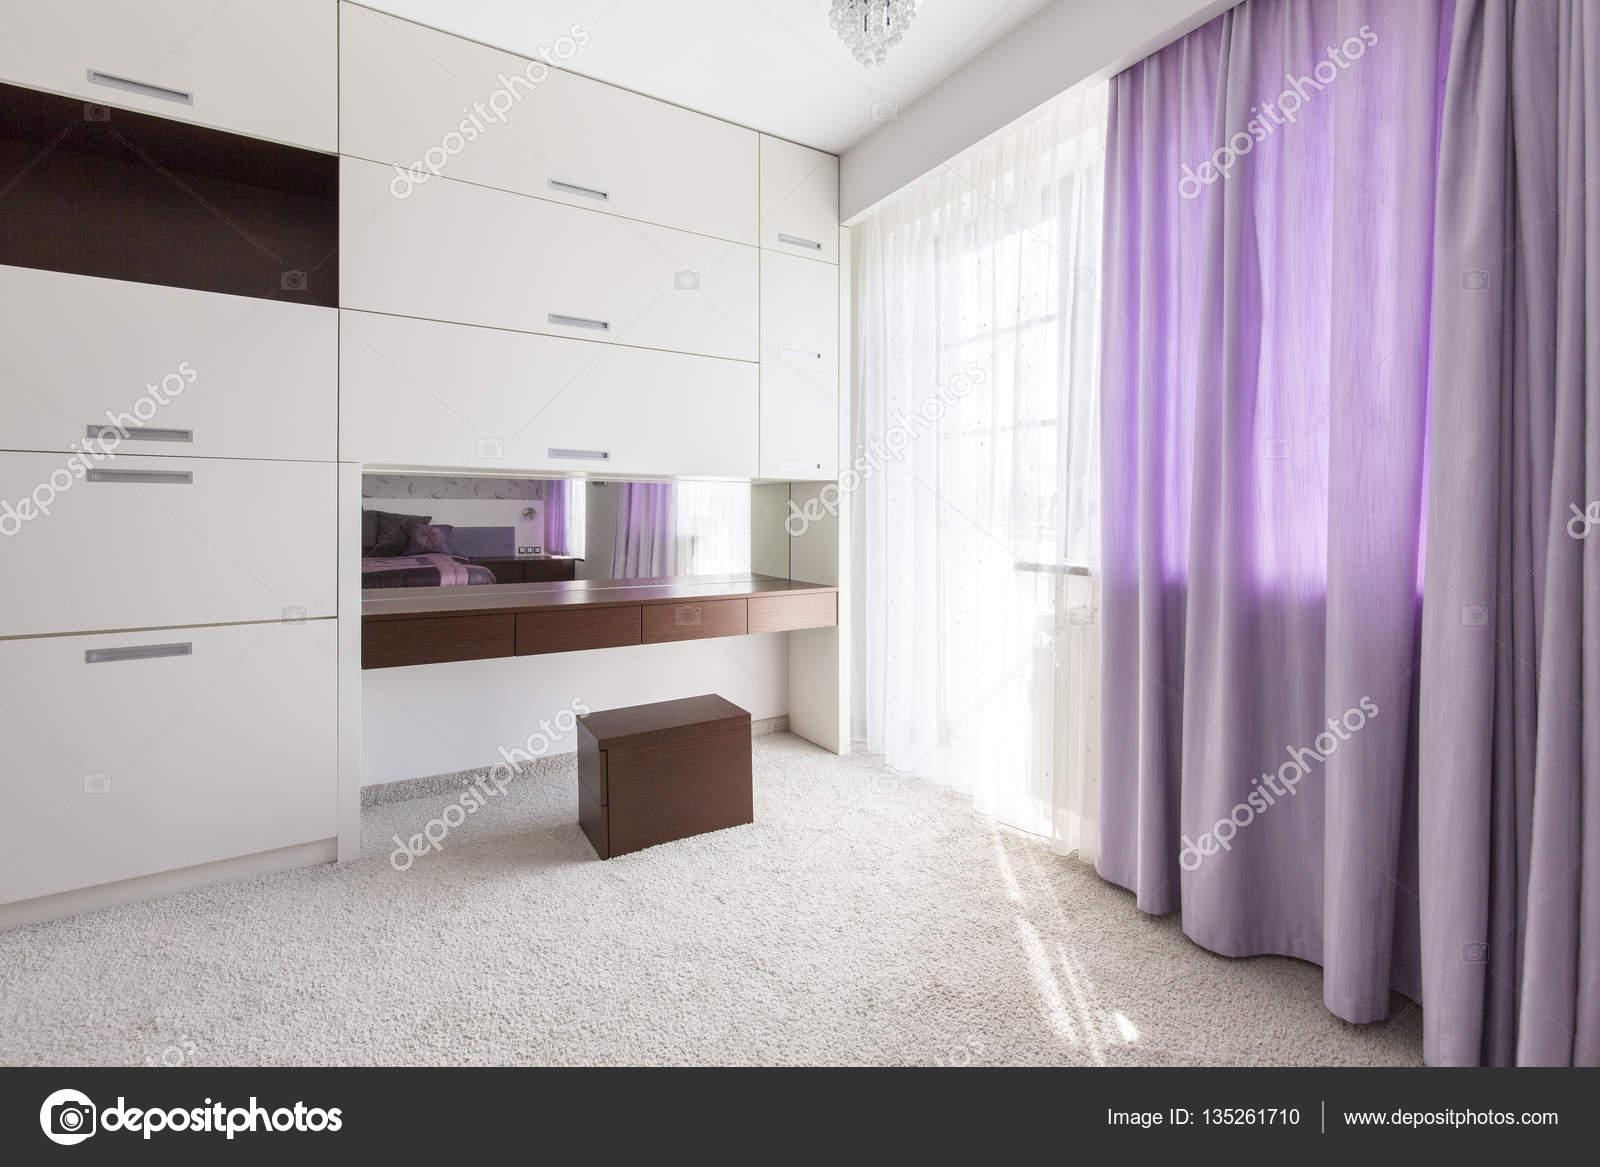 Gordijnen In Slaapkamer : Slaapkamer gordijnen elegant gordijnen woonkamer ikea zen